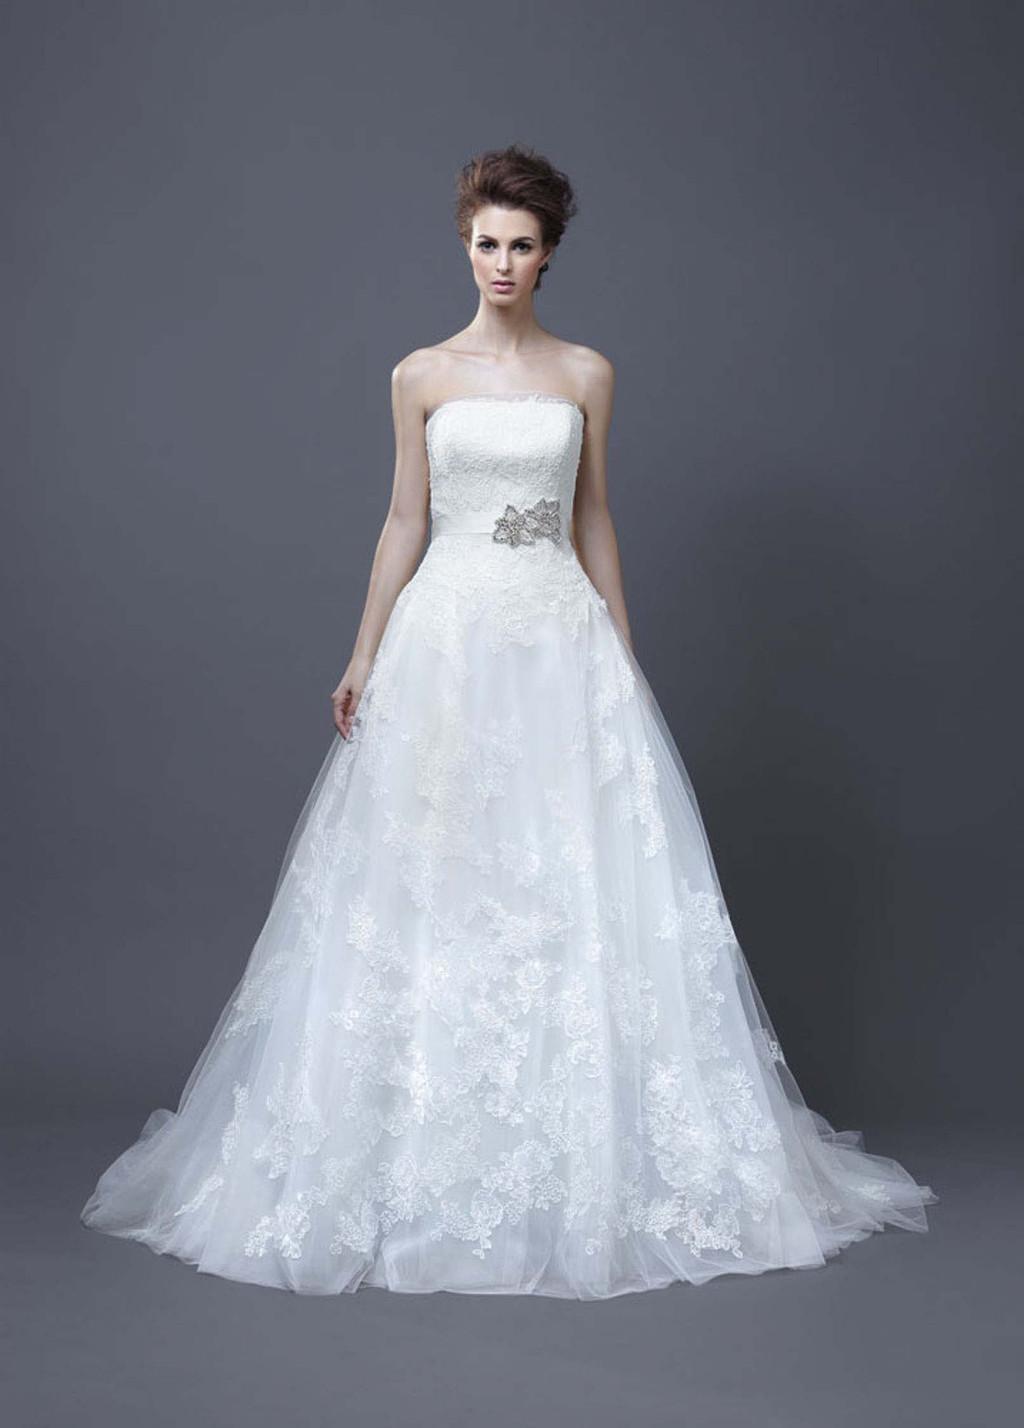 2013-wedding-dress-by-enzoani-bridal-halo.full